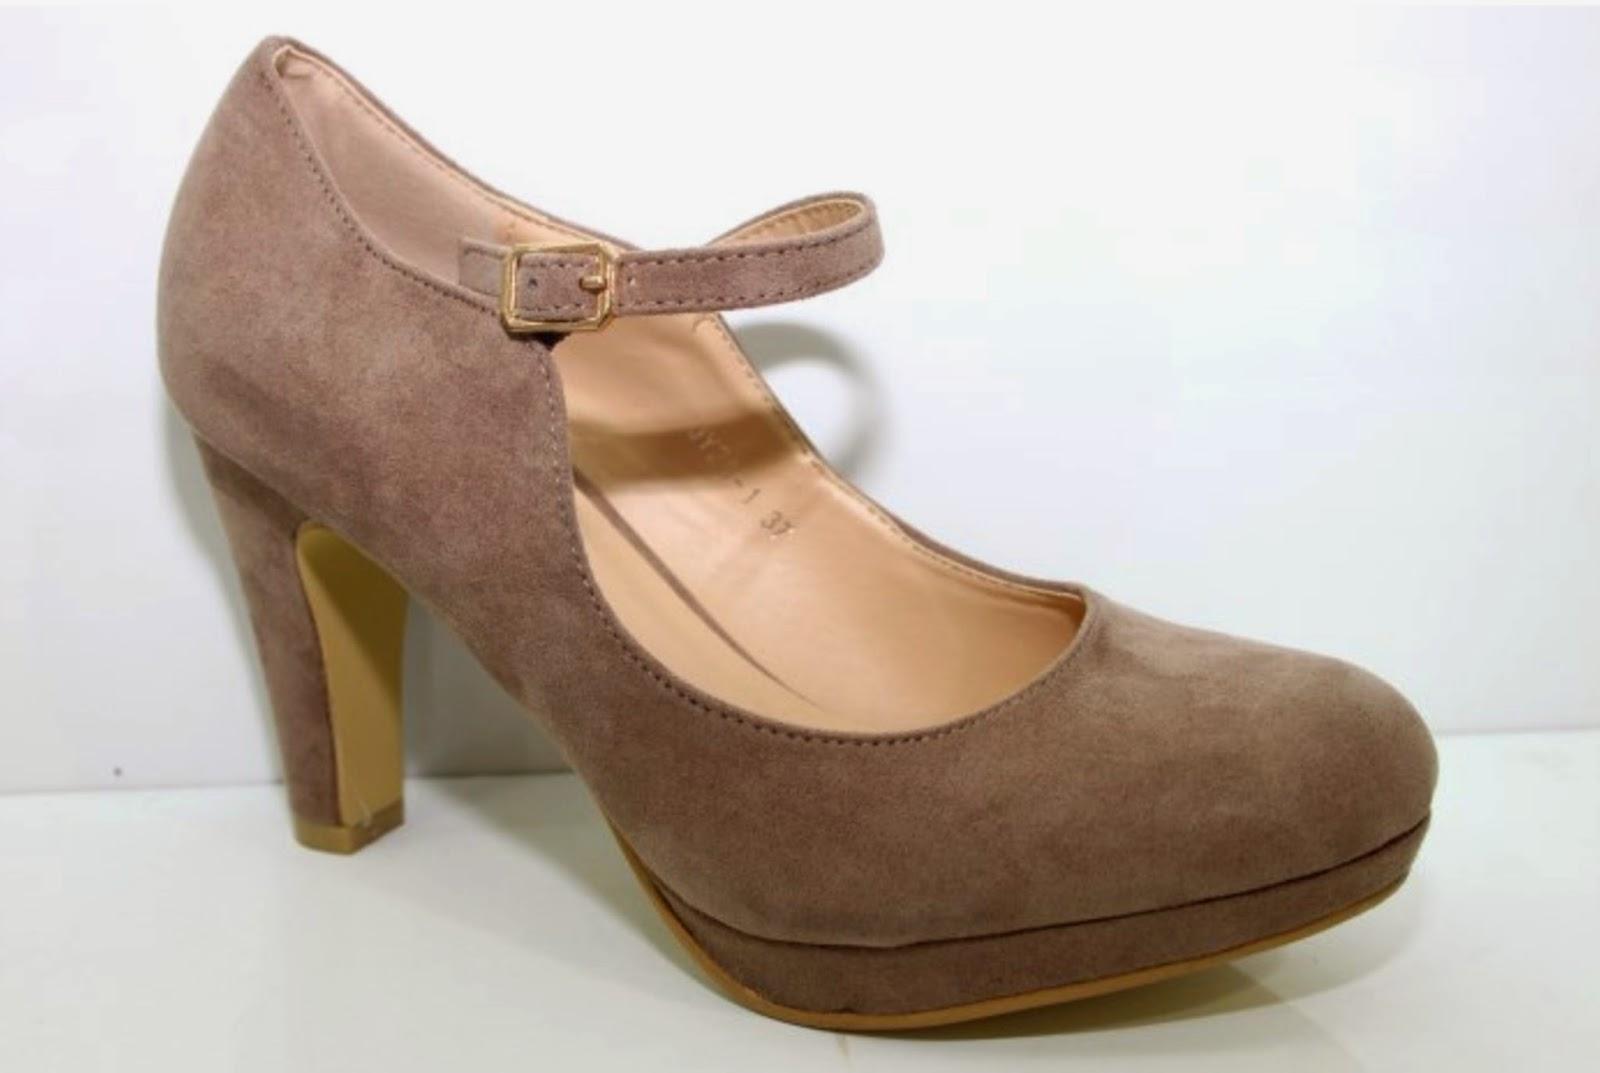 http://www.ebay.fr/itm/chaussures-femme-escarpins-bride-daim-bleu-marron-taupe-noir-36-37-38-39-40-41-/301472782744?ssPageName=STRK:MESE:IT